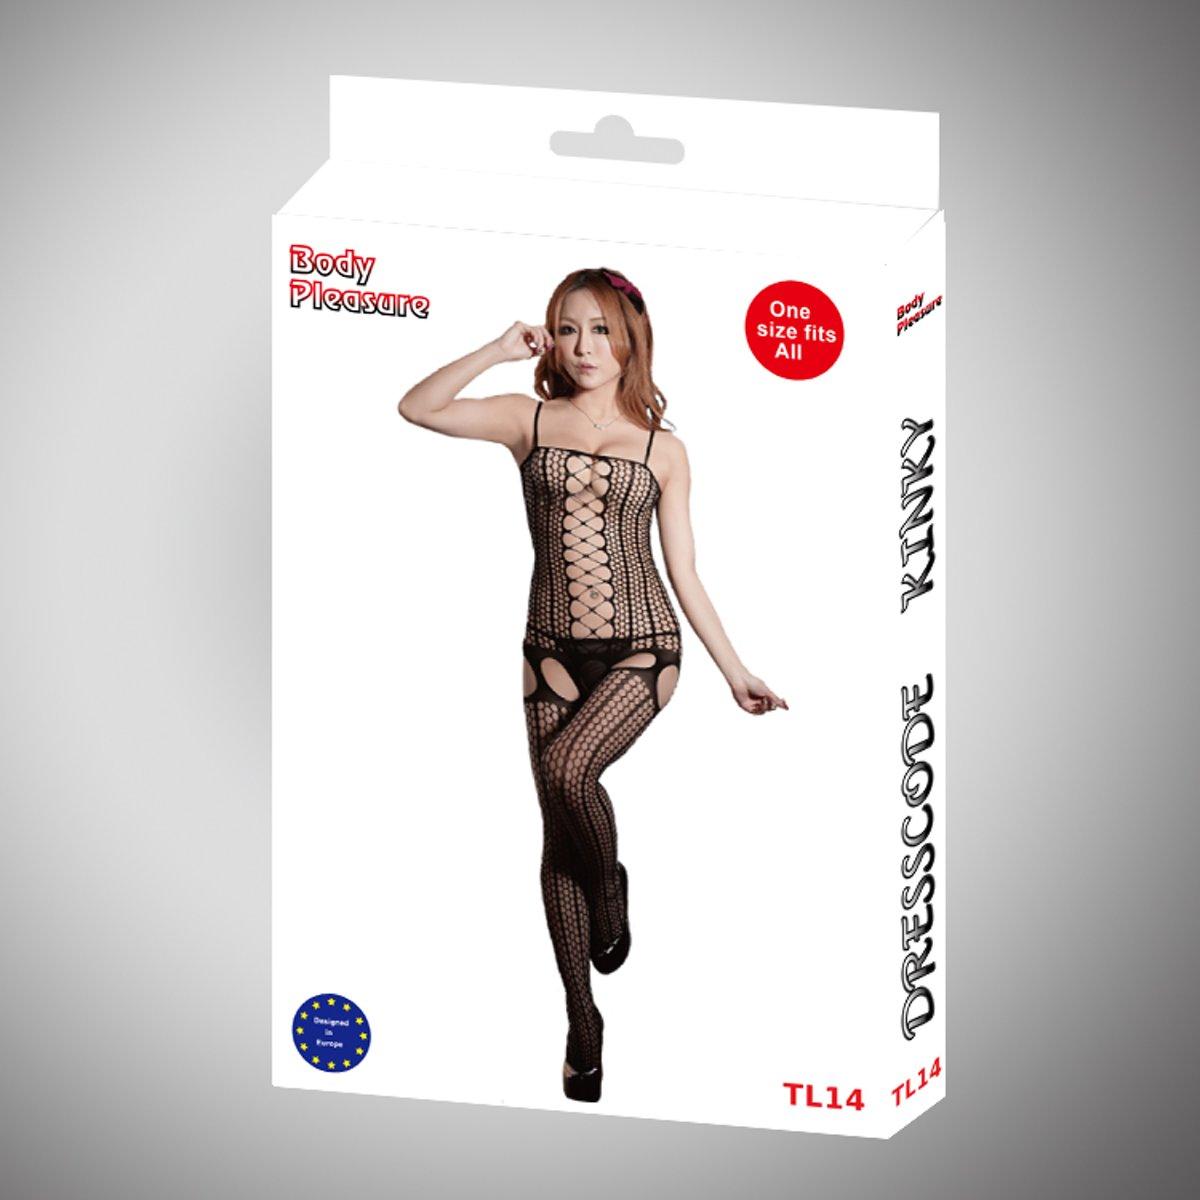 Foto van Body Pleasure - Sexy Lingerie set - 2-Pack - Met Chique Cadeau Verpakking In Full Colour - TL14+TL16 - One Size - Zwart